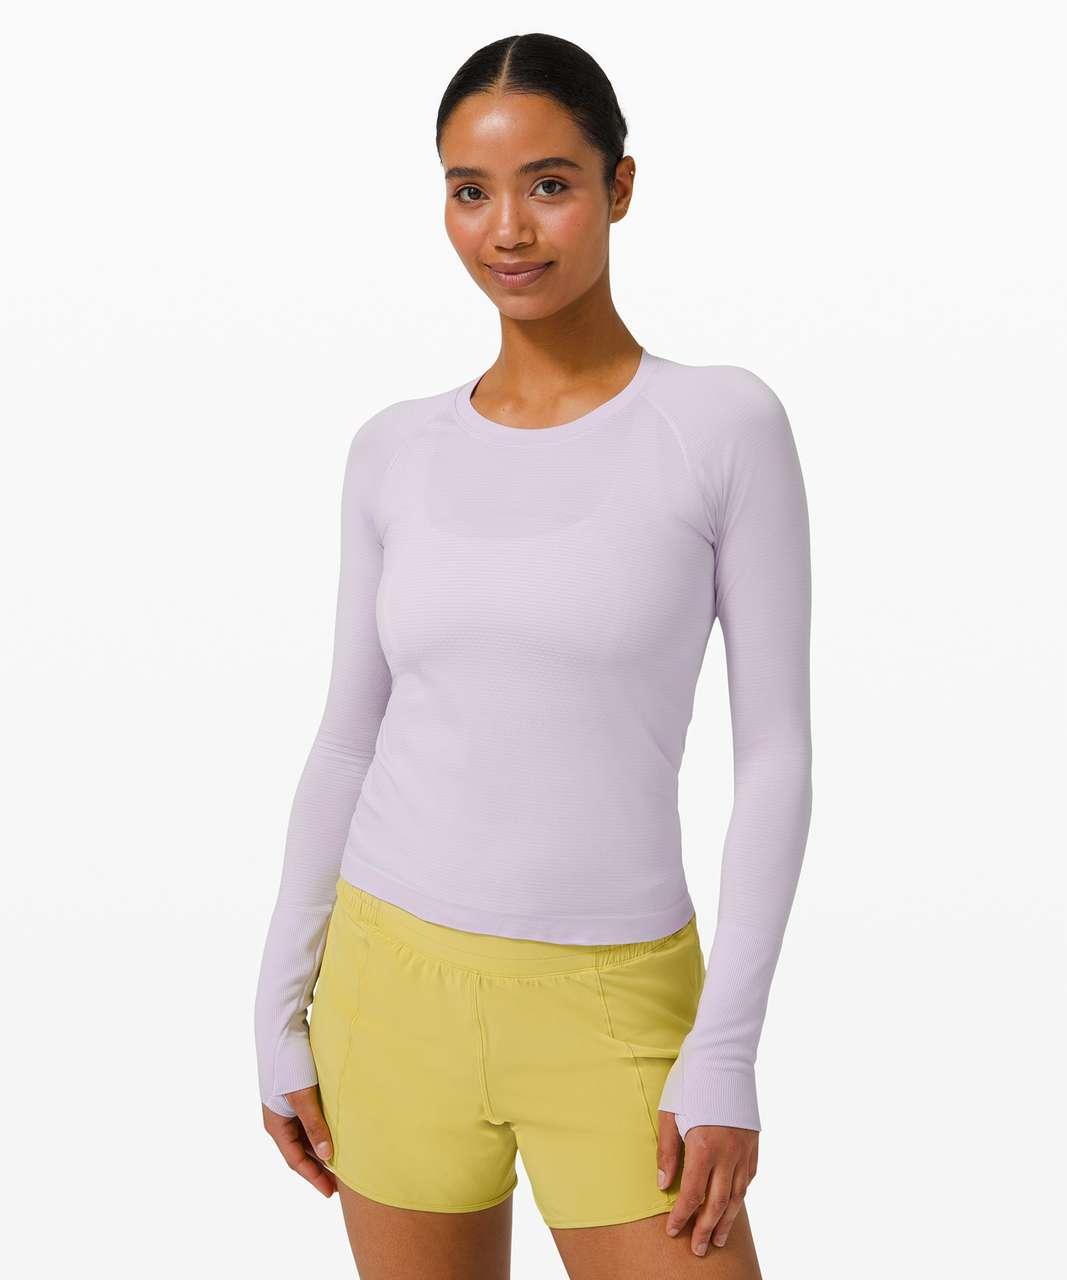 Lululemon Swiftly Tech Long Sleeve 2.0 *Race Length - Lavender Dew / Lavender Dew